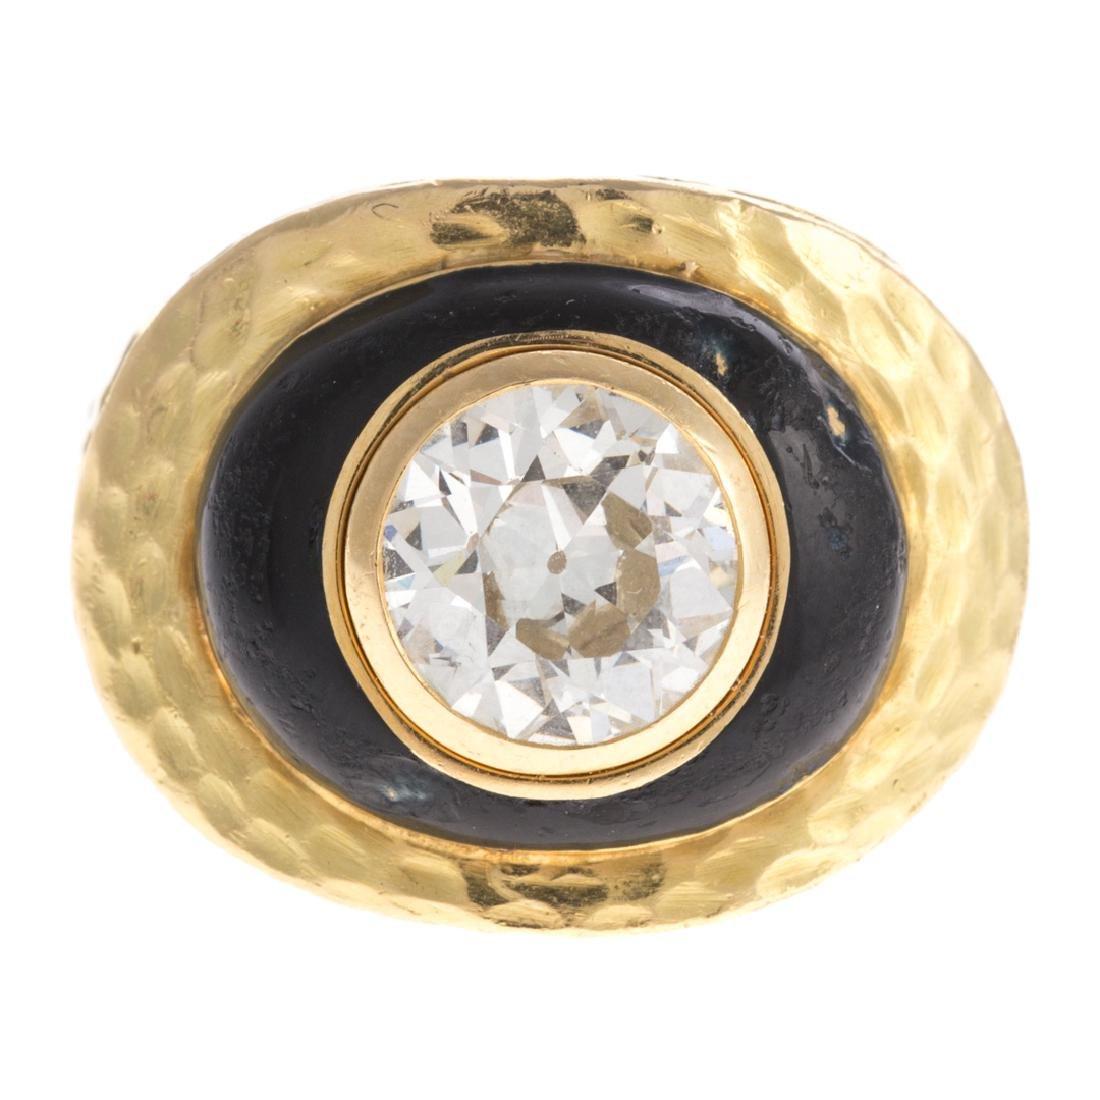 A 18K Diamond Ring & Enamel by David Webb